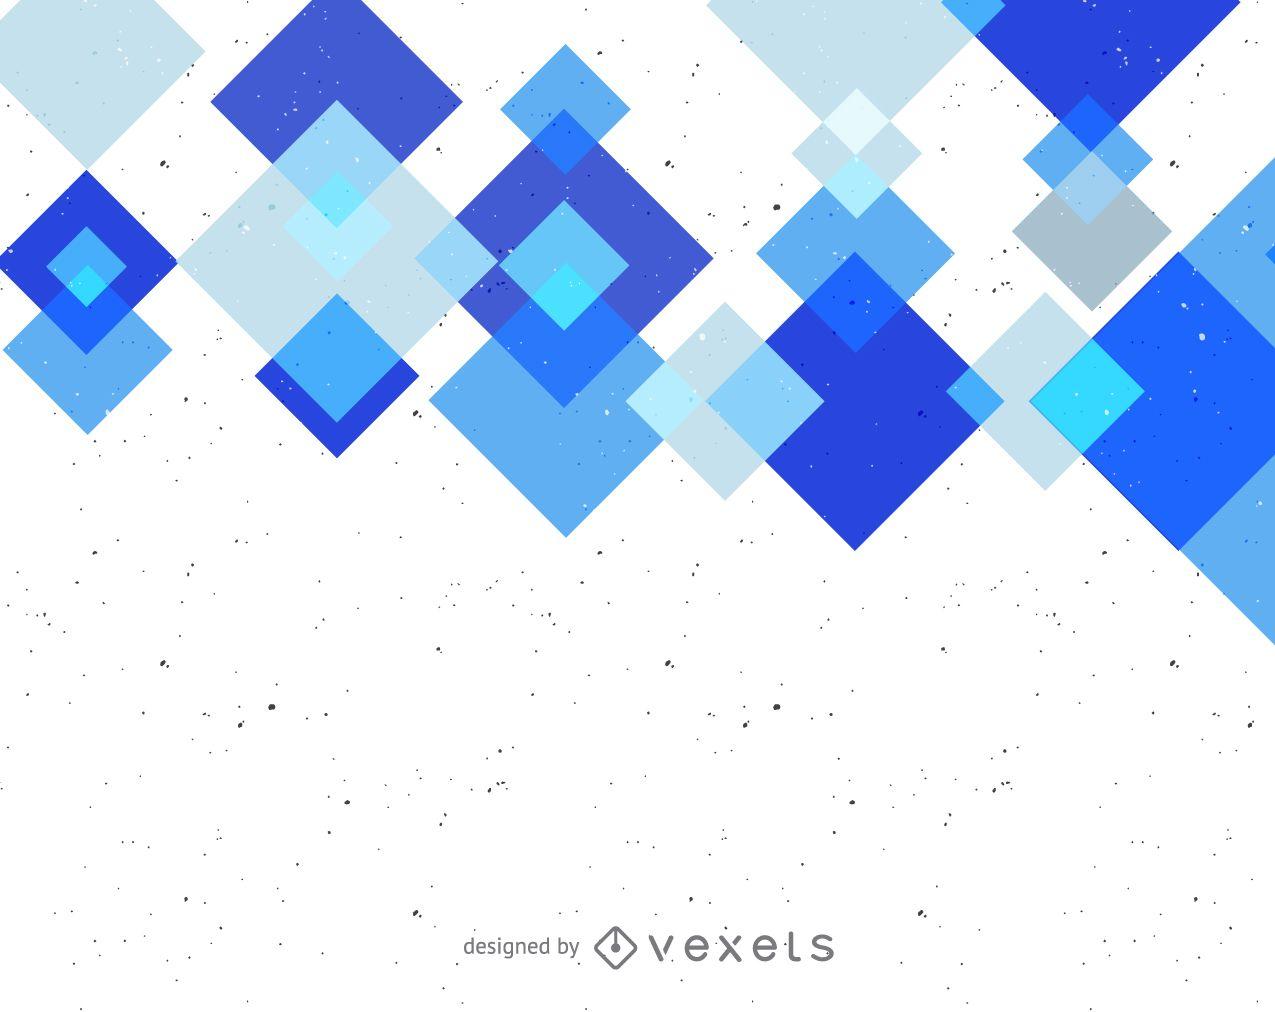 946f99662fa4e Fondo abstracto con formas geométricas azules. Descargar imagen grande  1275x1012px. license image  user